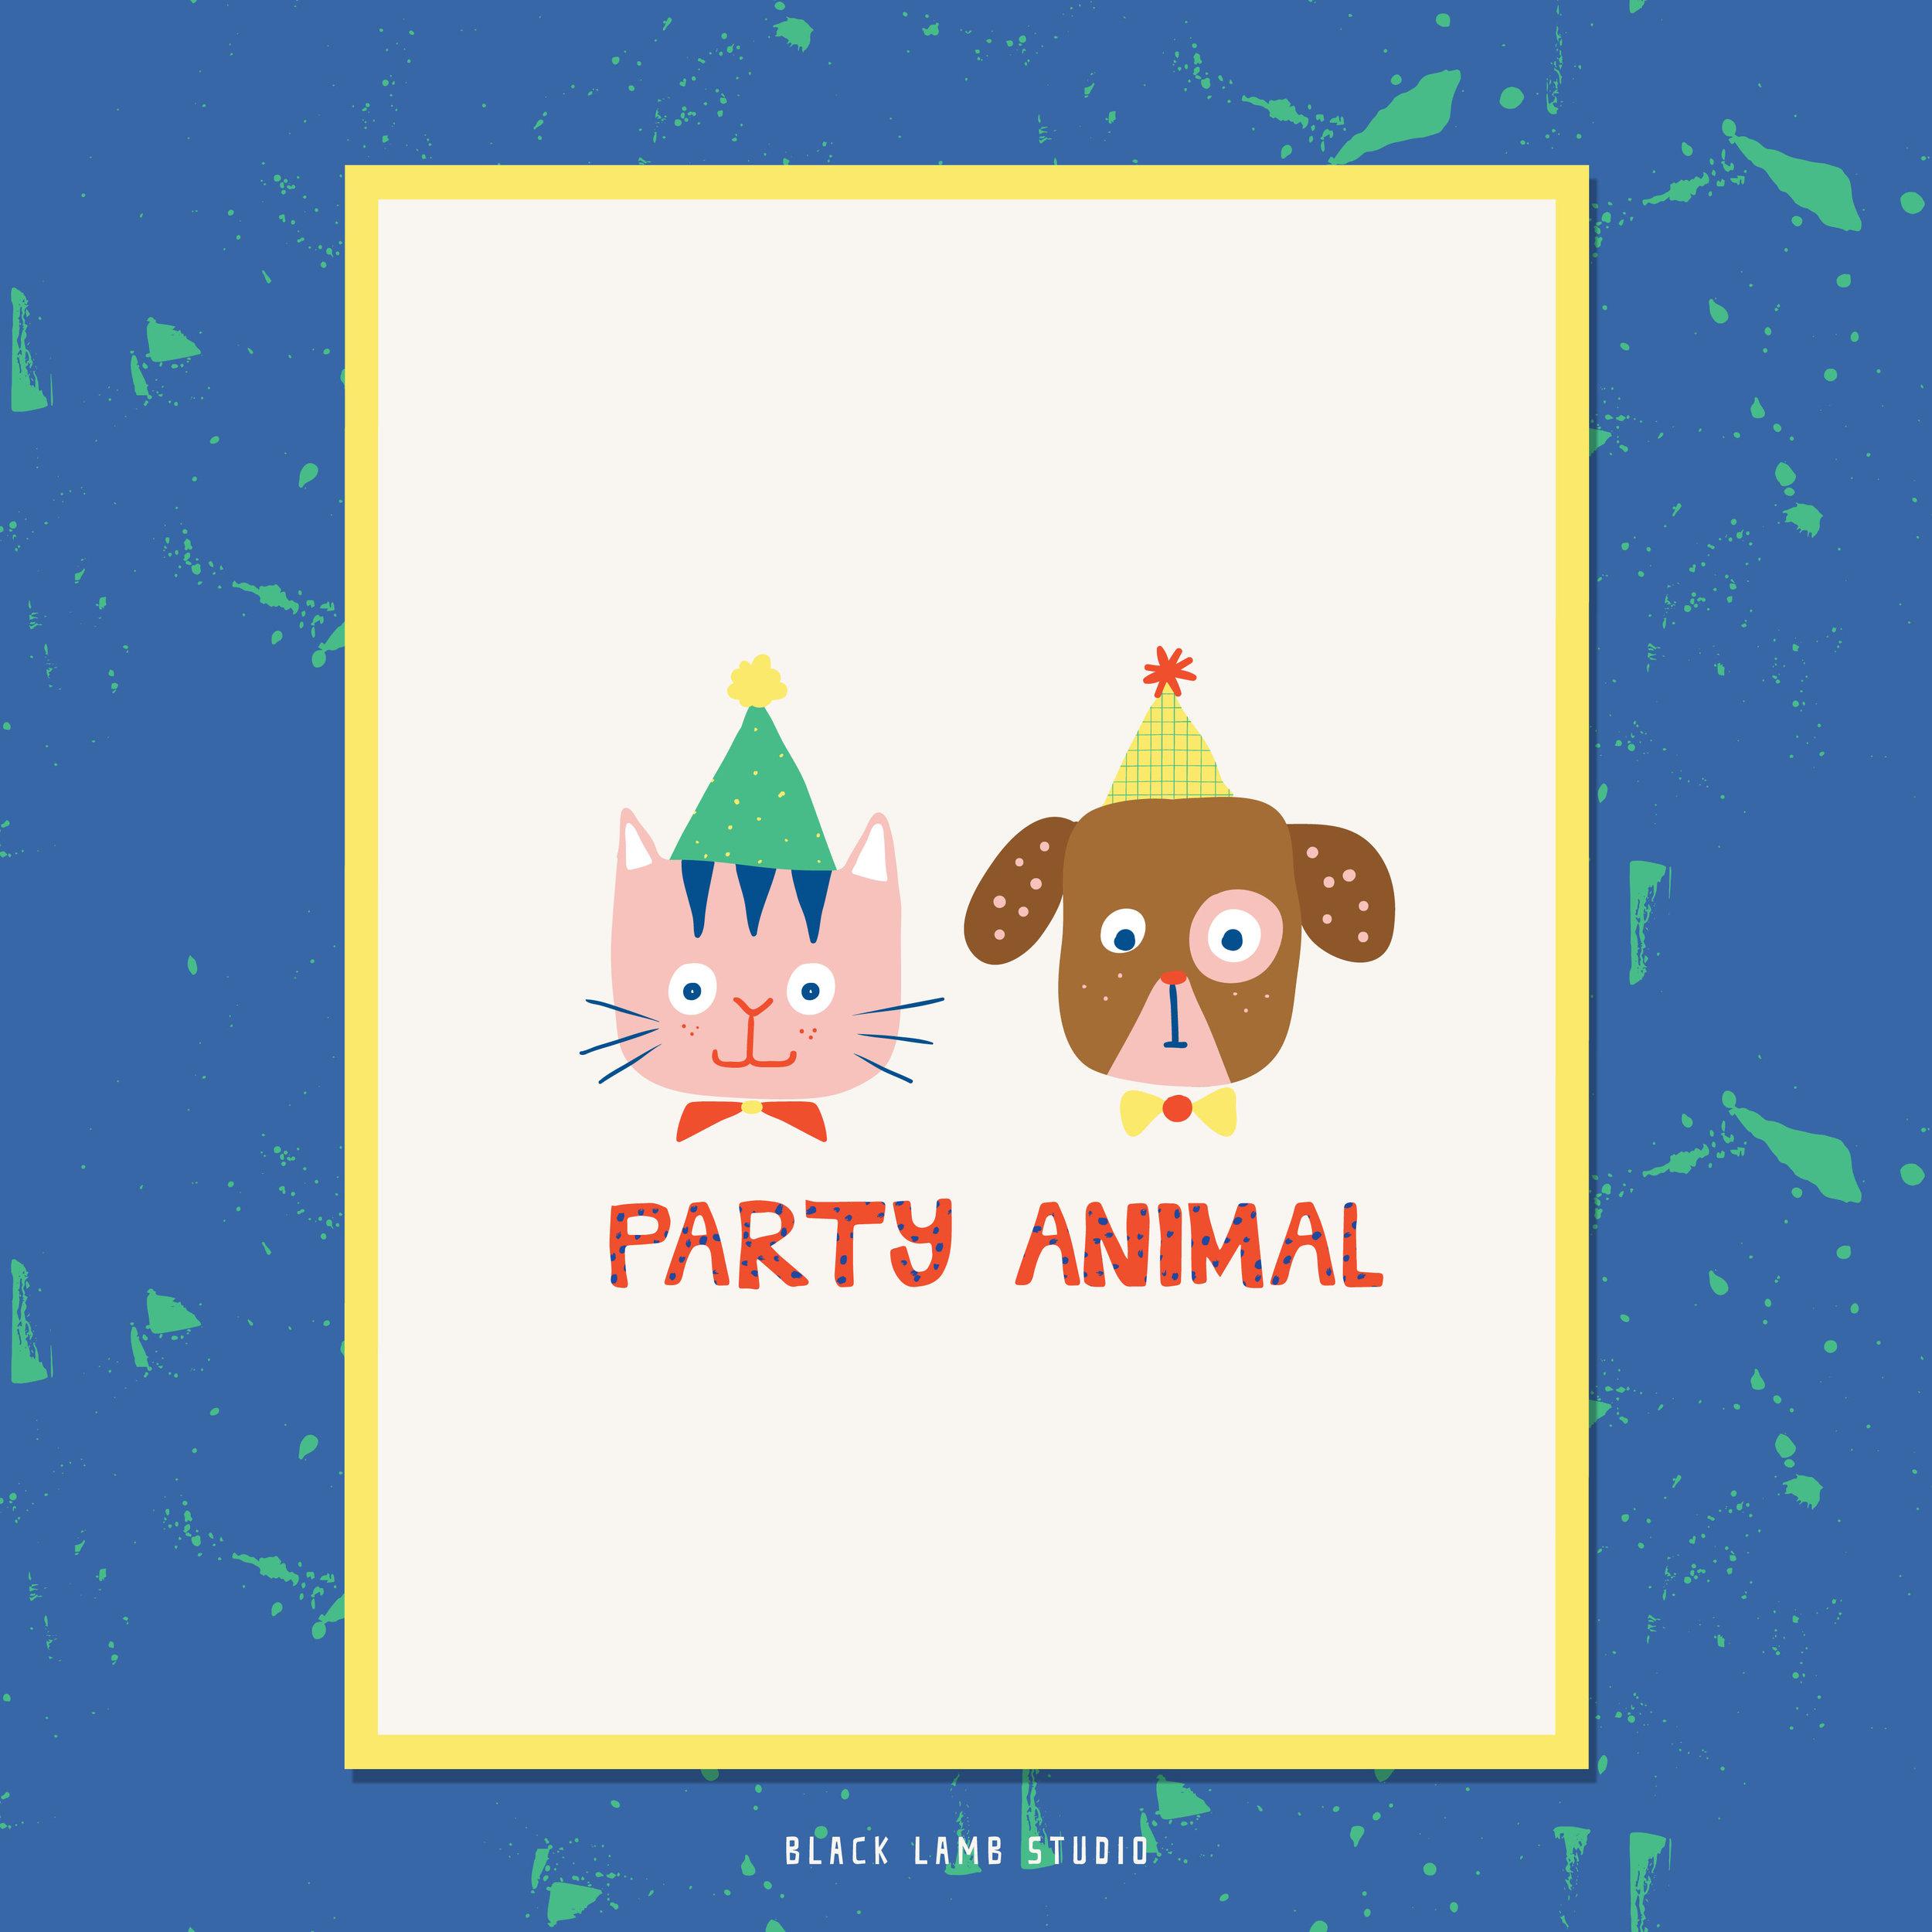 party animal.jpg